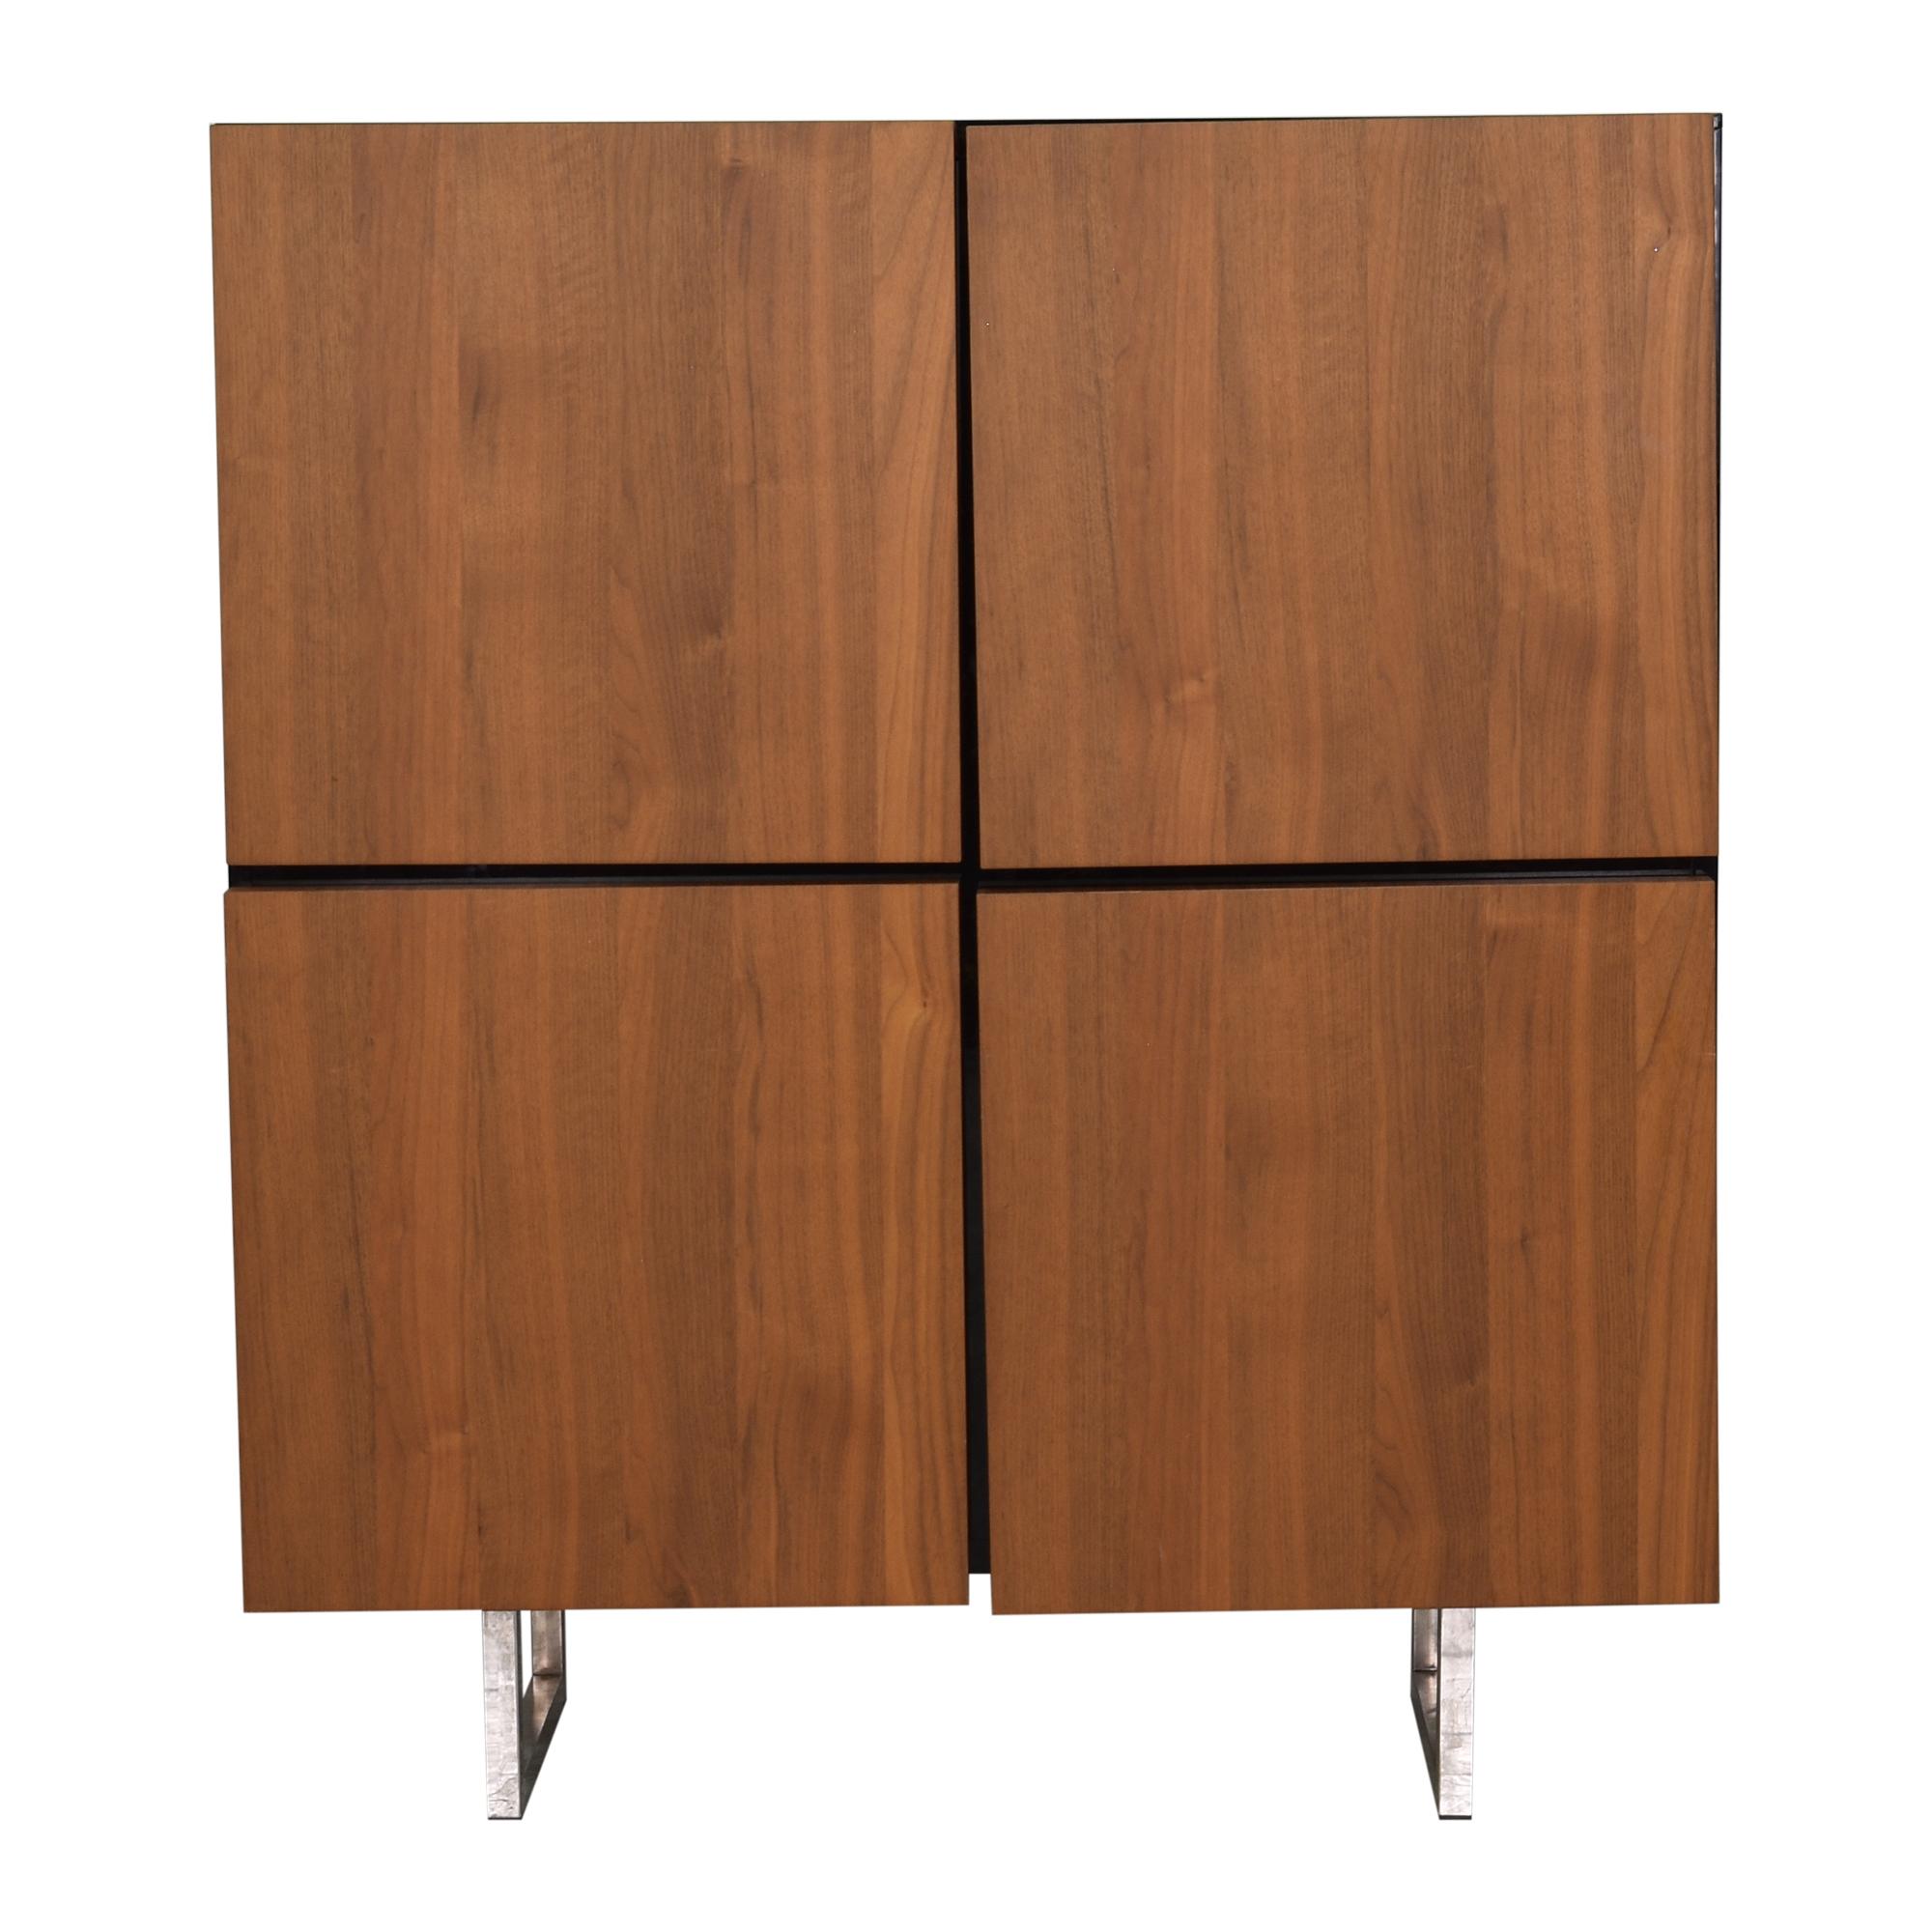 Calligaris Calligaris Seattle Four Door Cabinet Cabinets & Sideboards